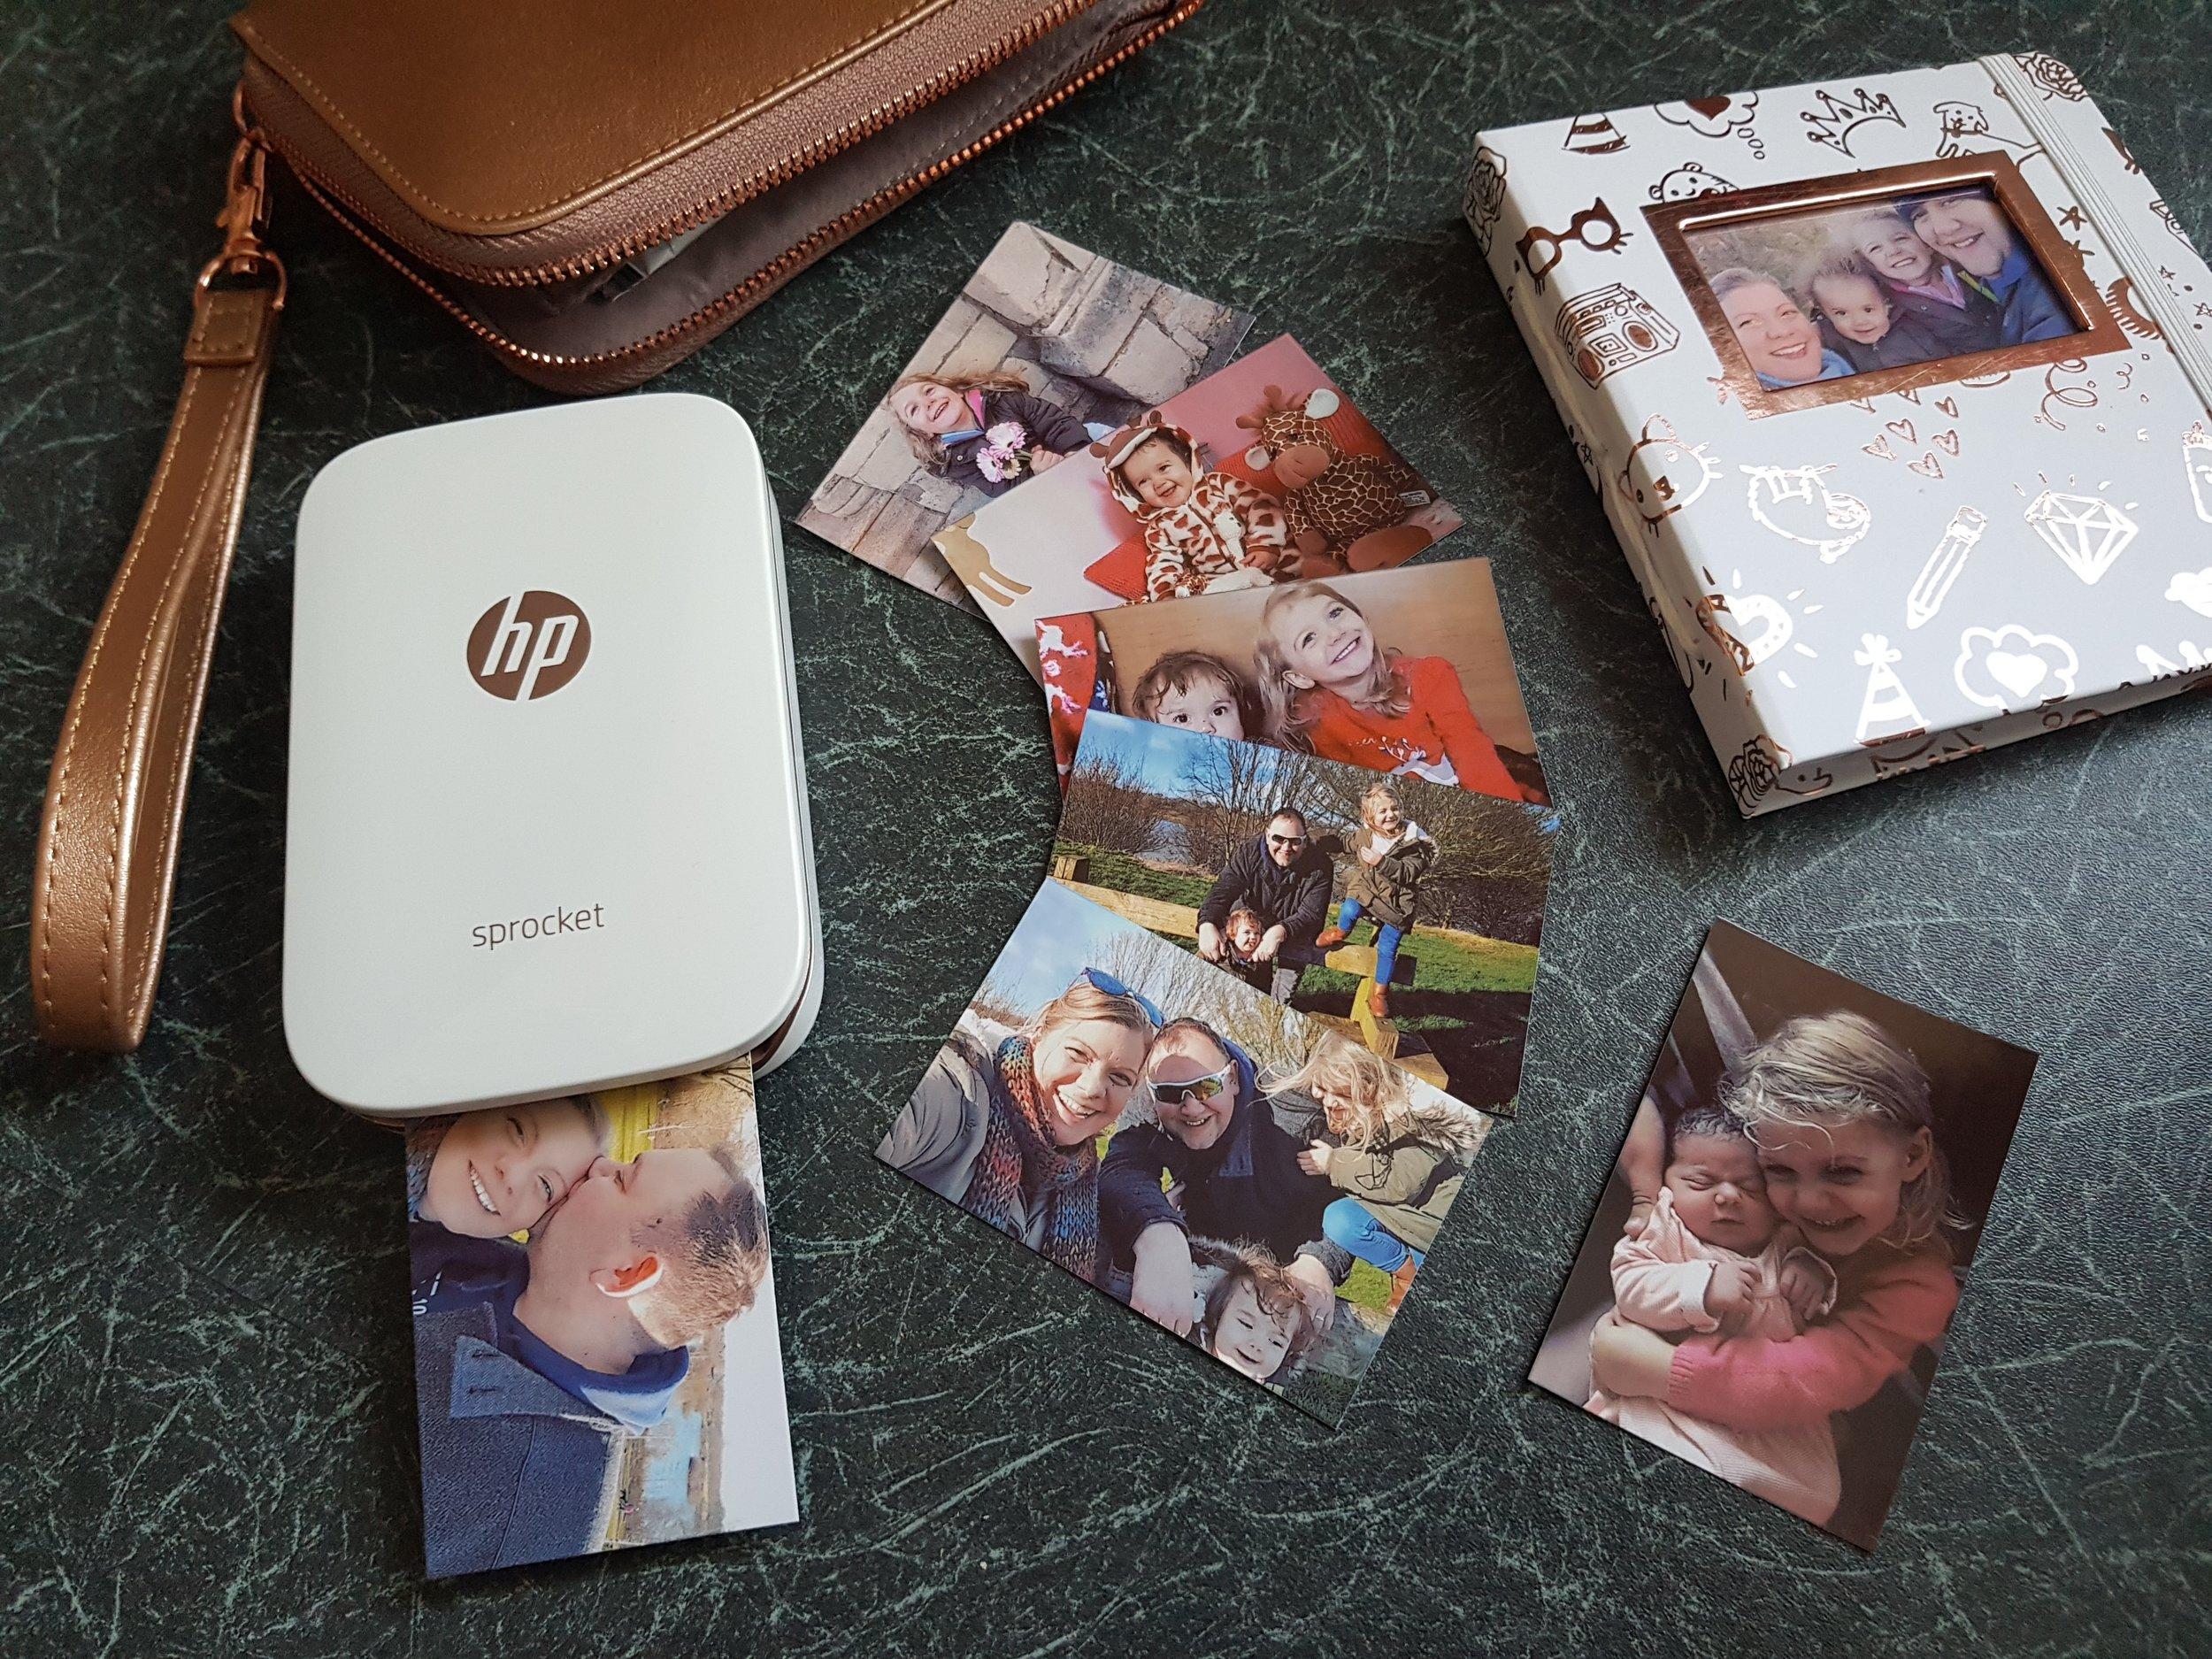 HP Sprocket family photo printing